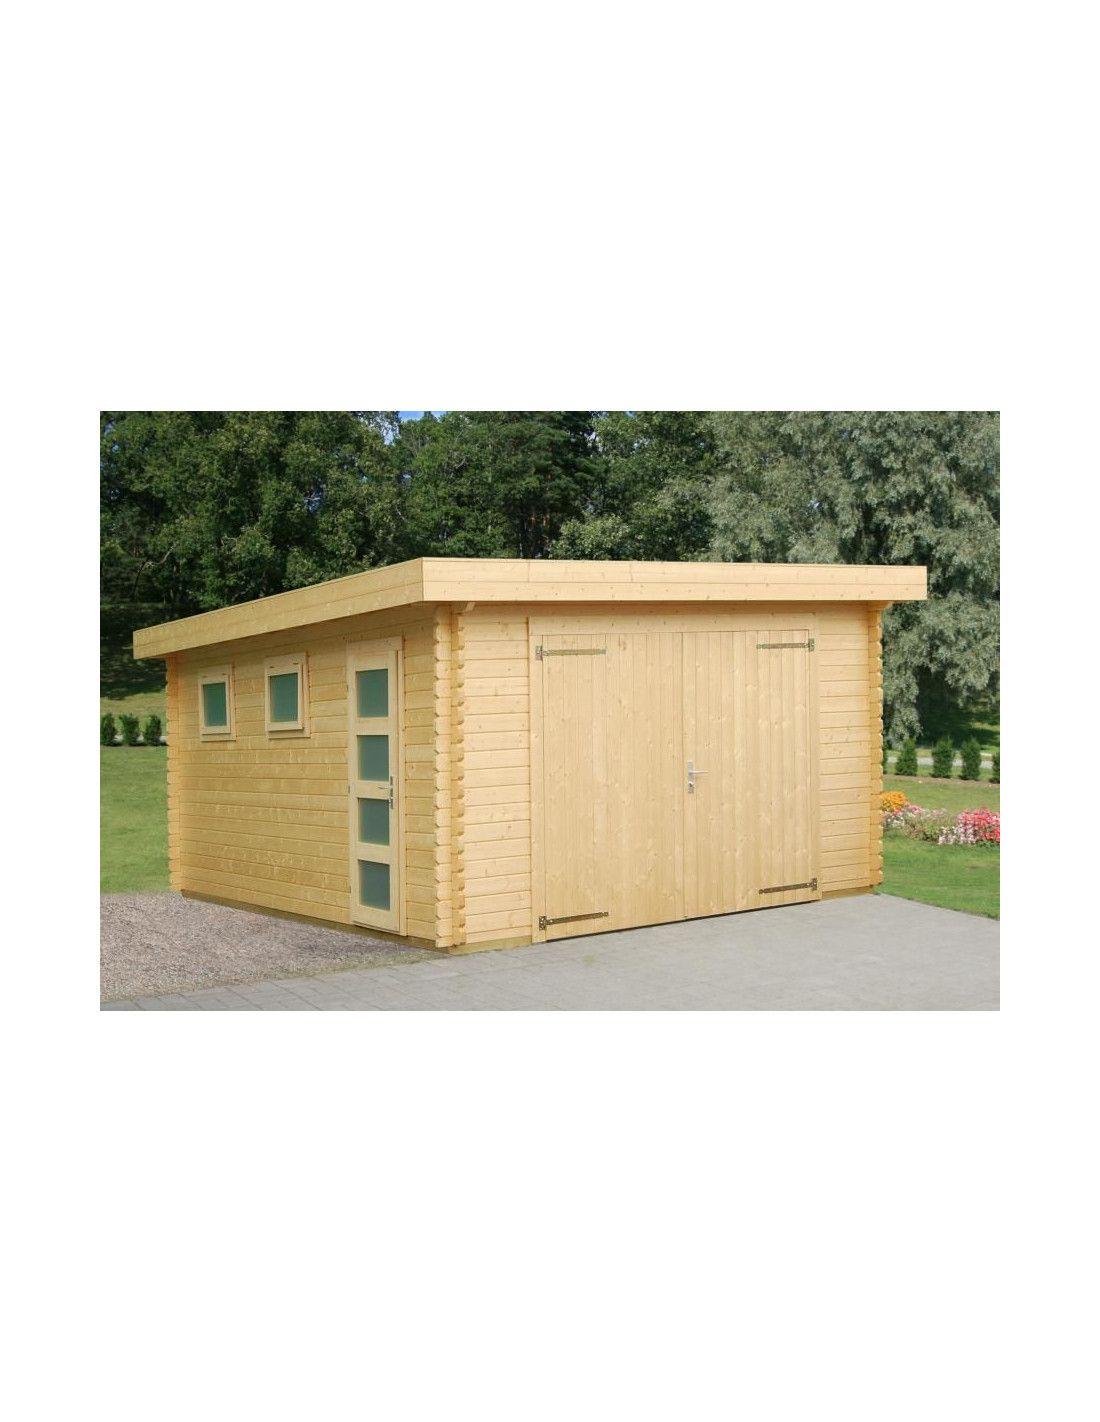 Garaje de madera modelo novel for Garajes con jardin